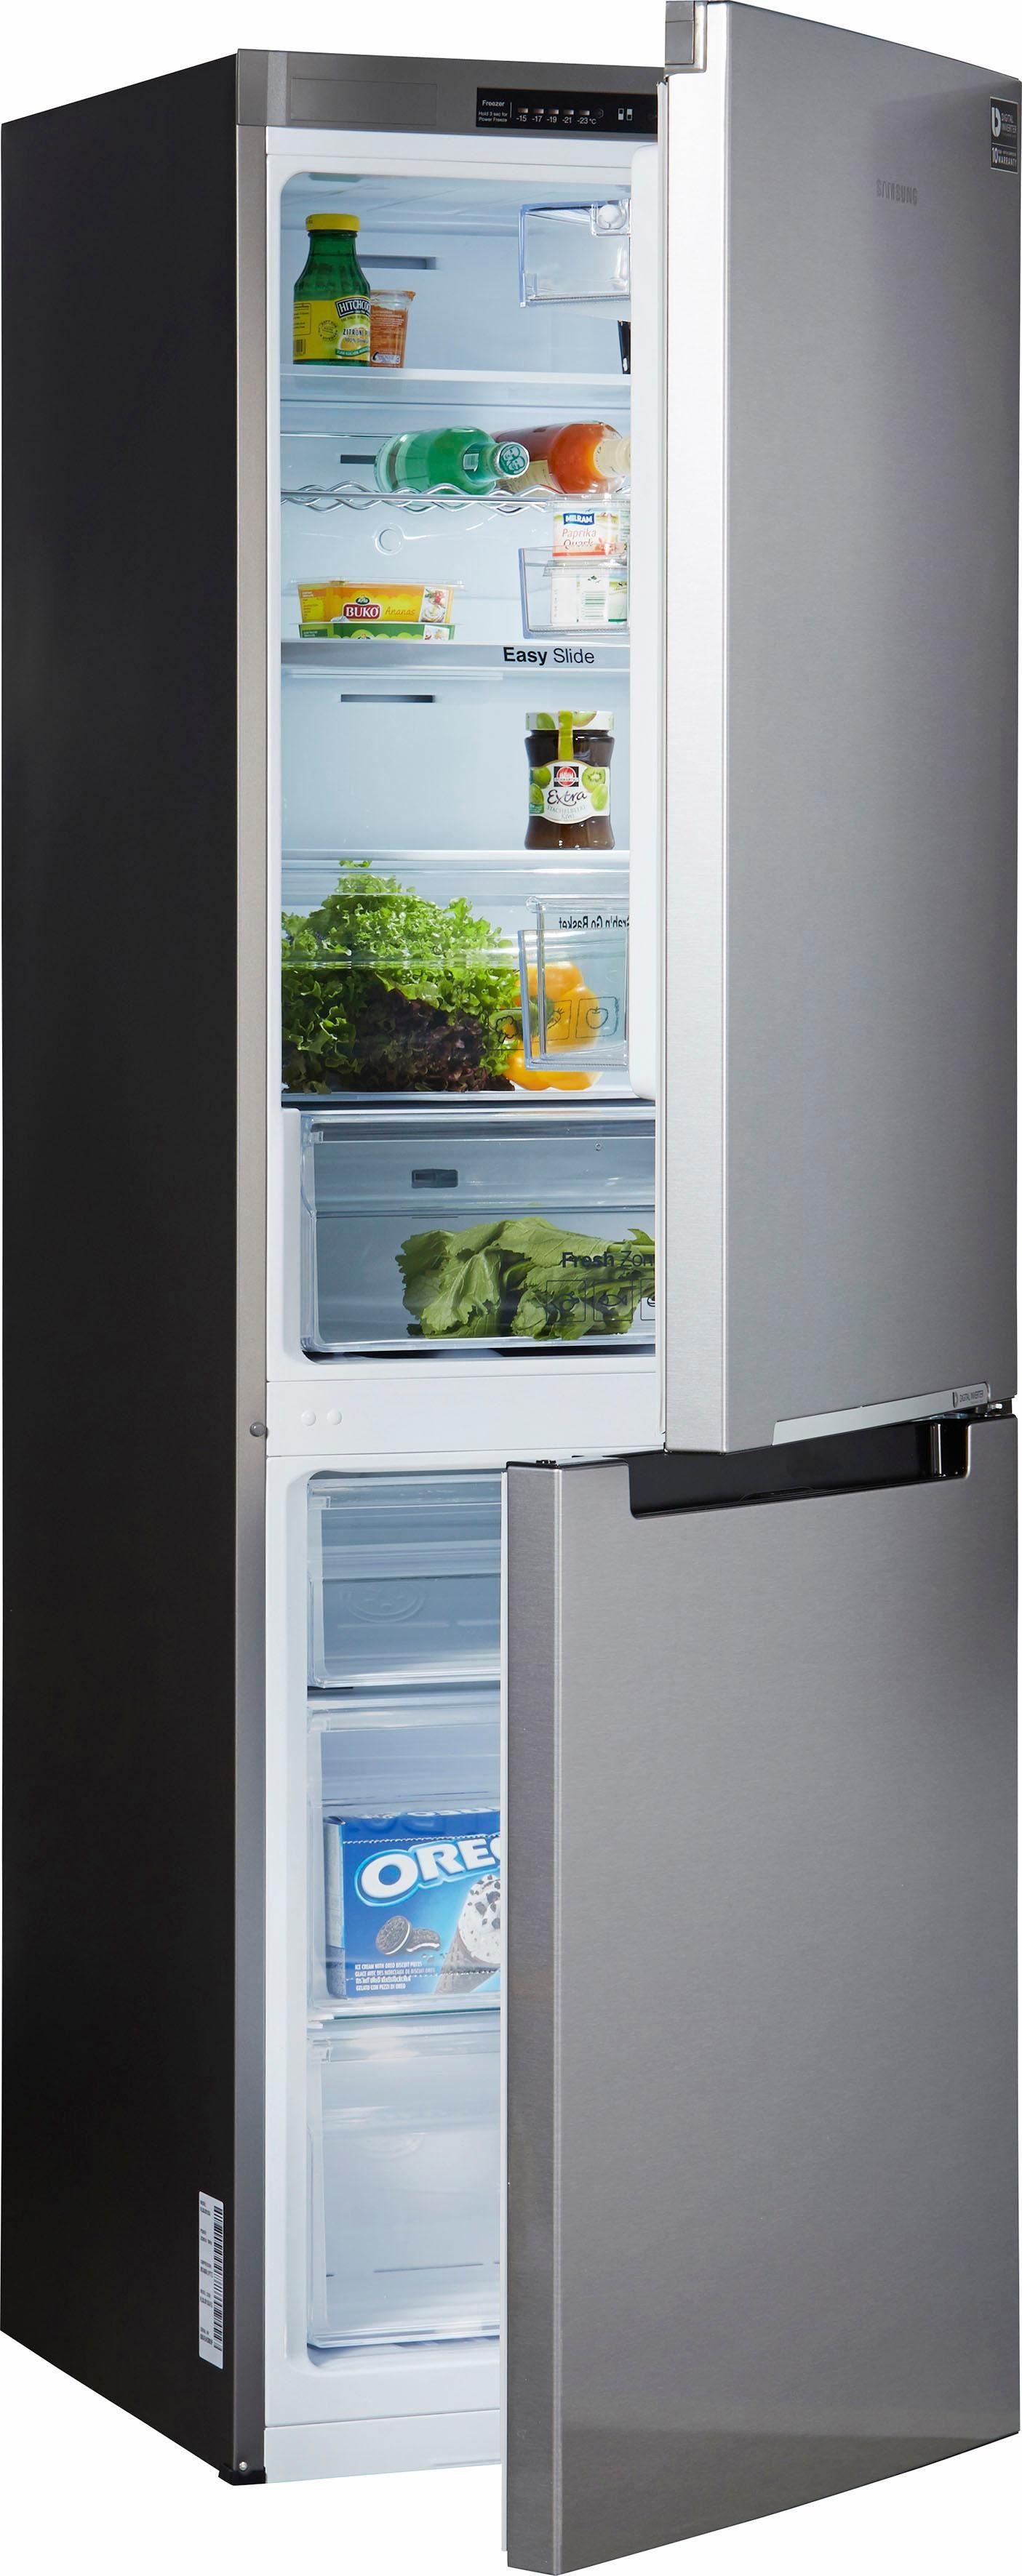 Samsung Kühl-/Gefrierkombination RL30J3015SA, A++, 178 cm hoch, NoFrost